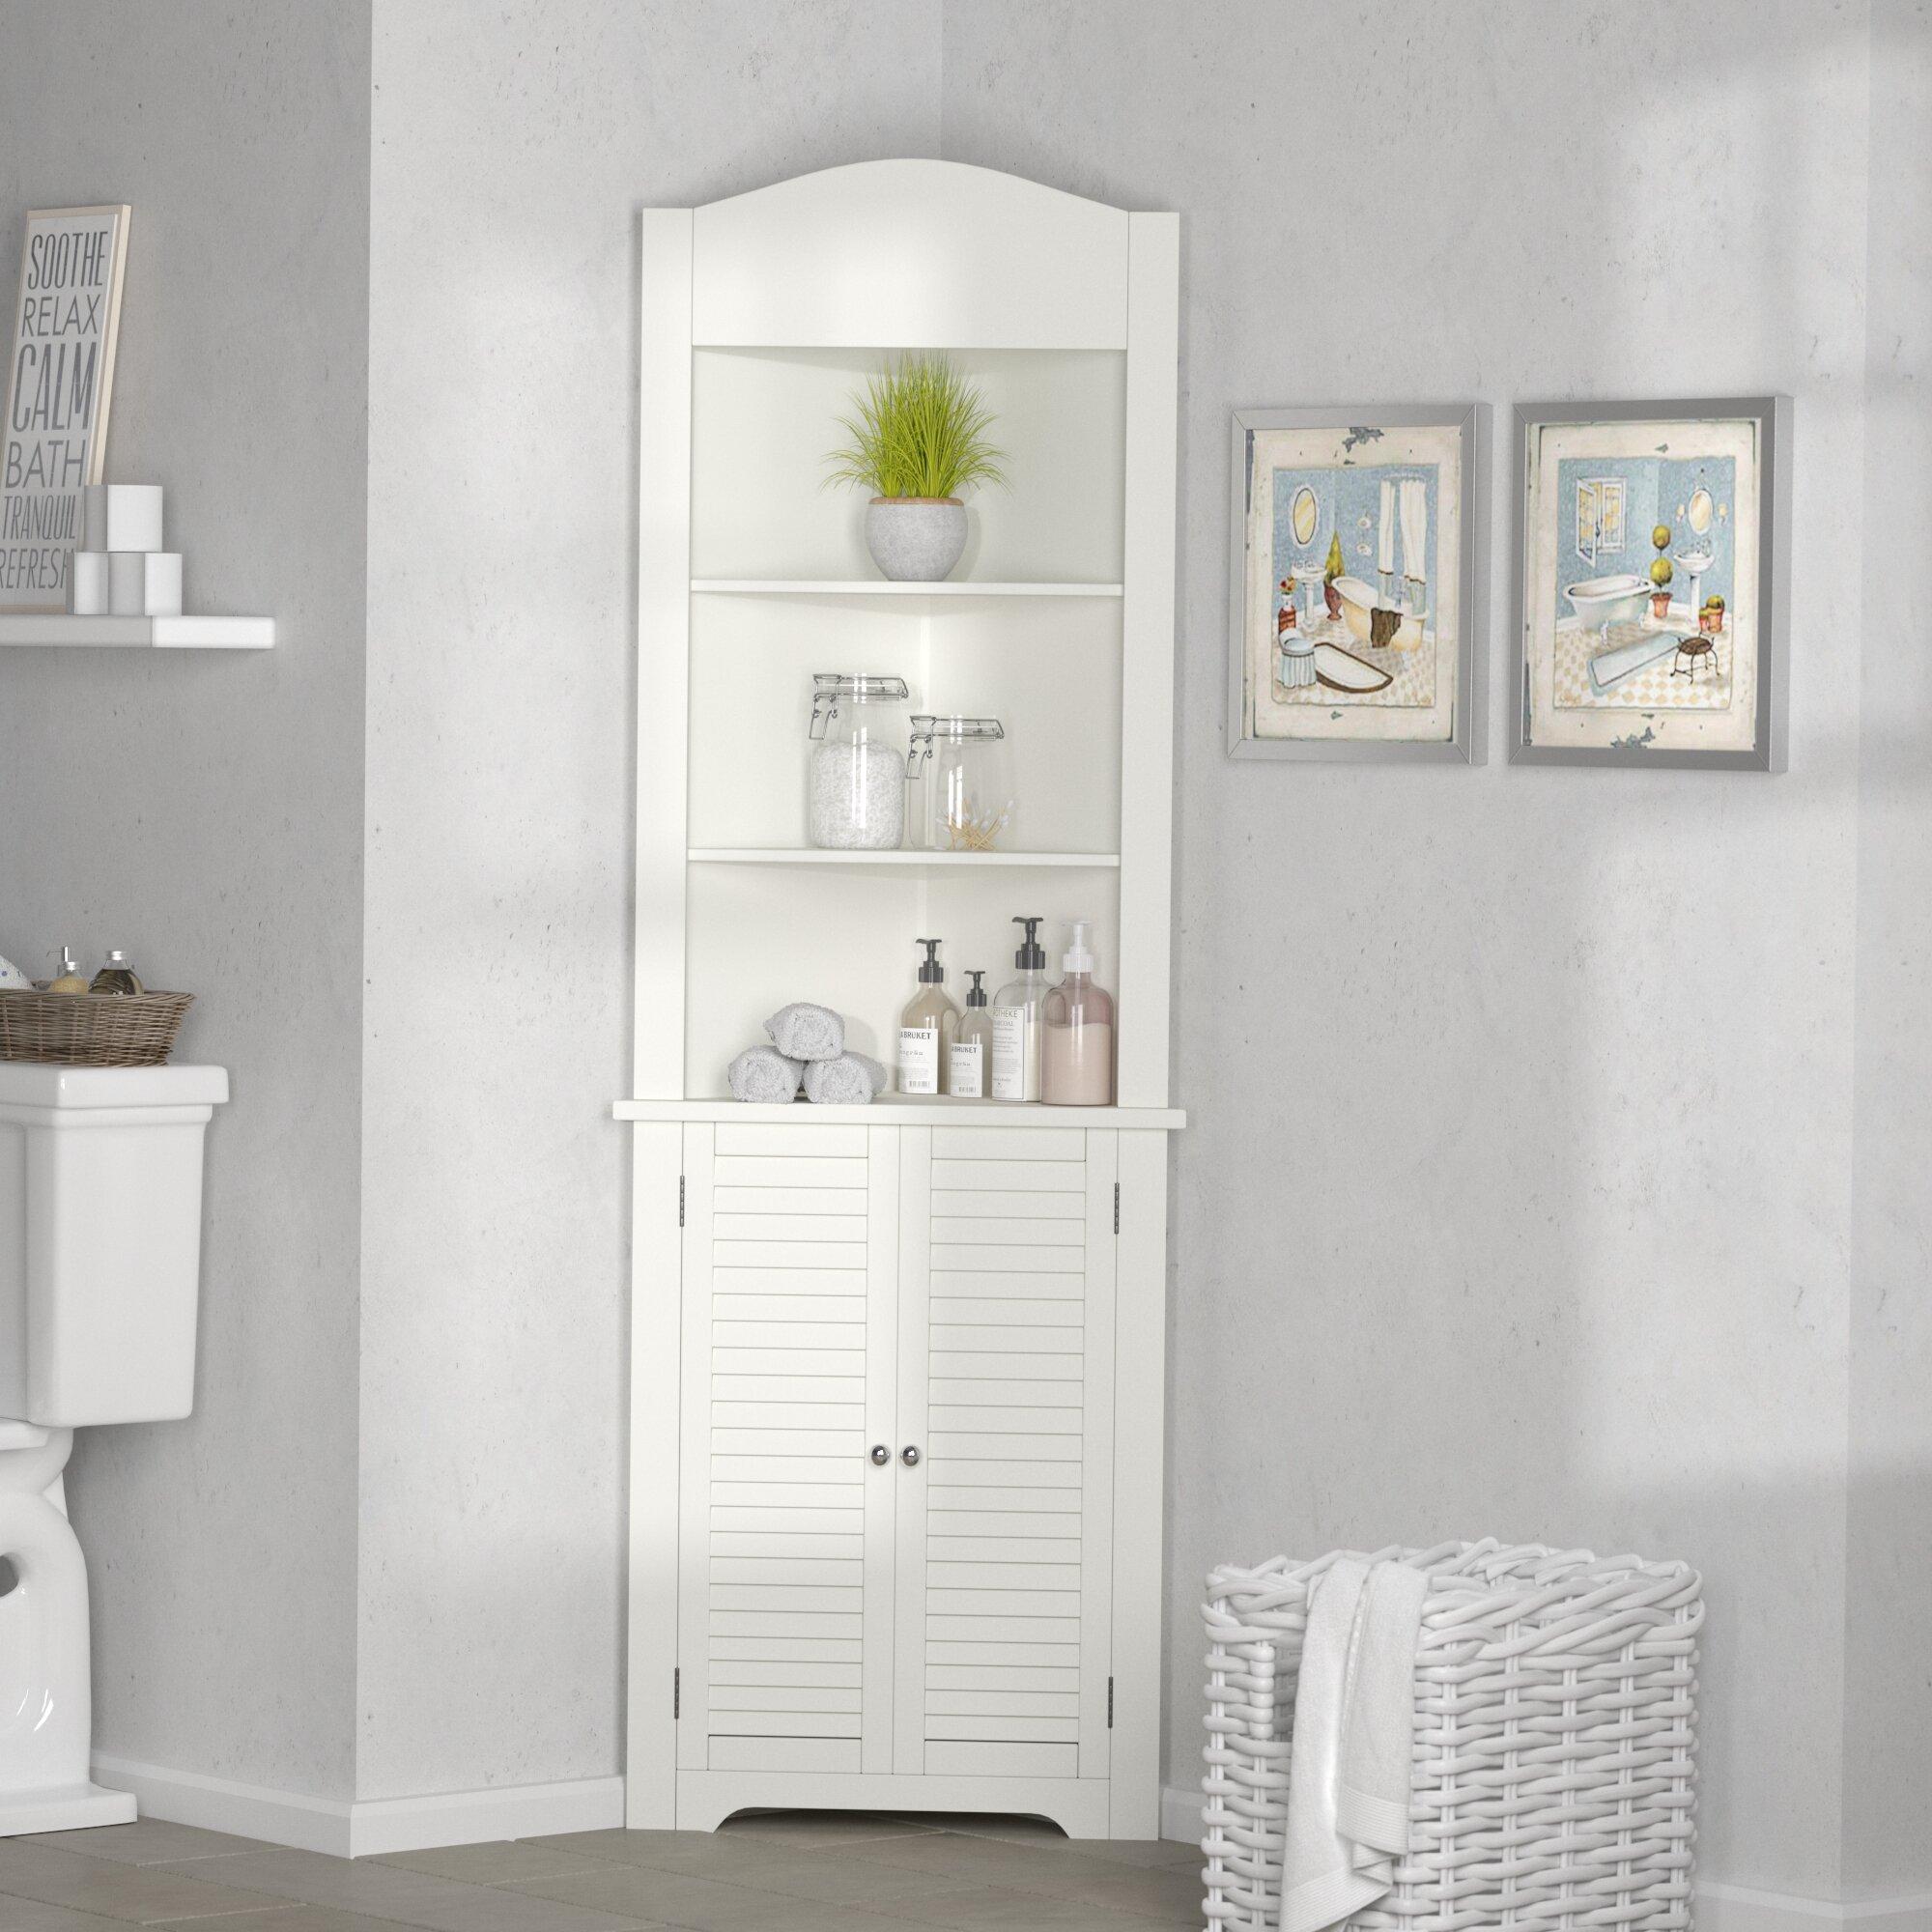 Longshore Tides Ellsworth 59cm W X 174cm H X Tall Bathroom Cabinet Reviews Wayfair Co Uk